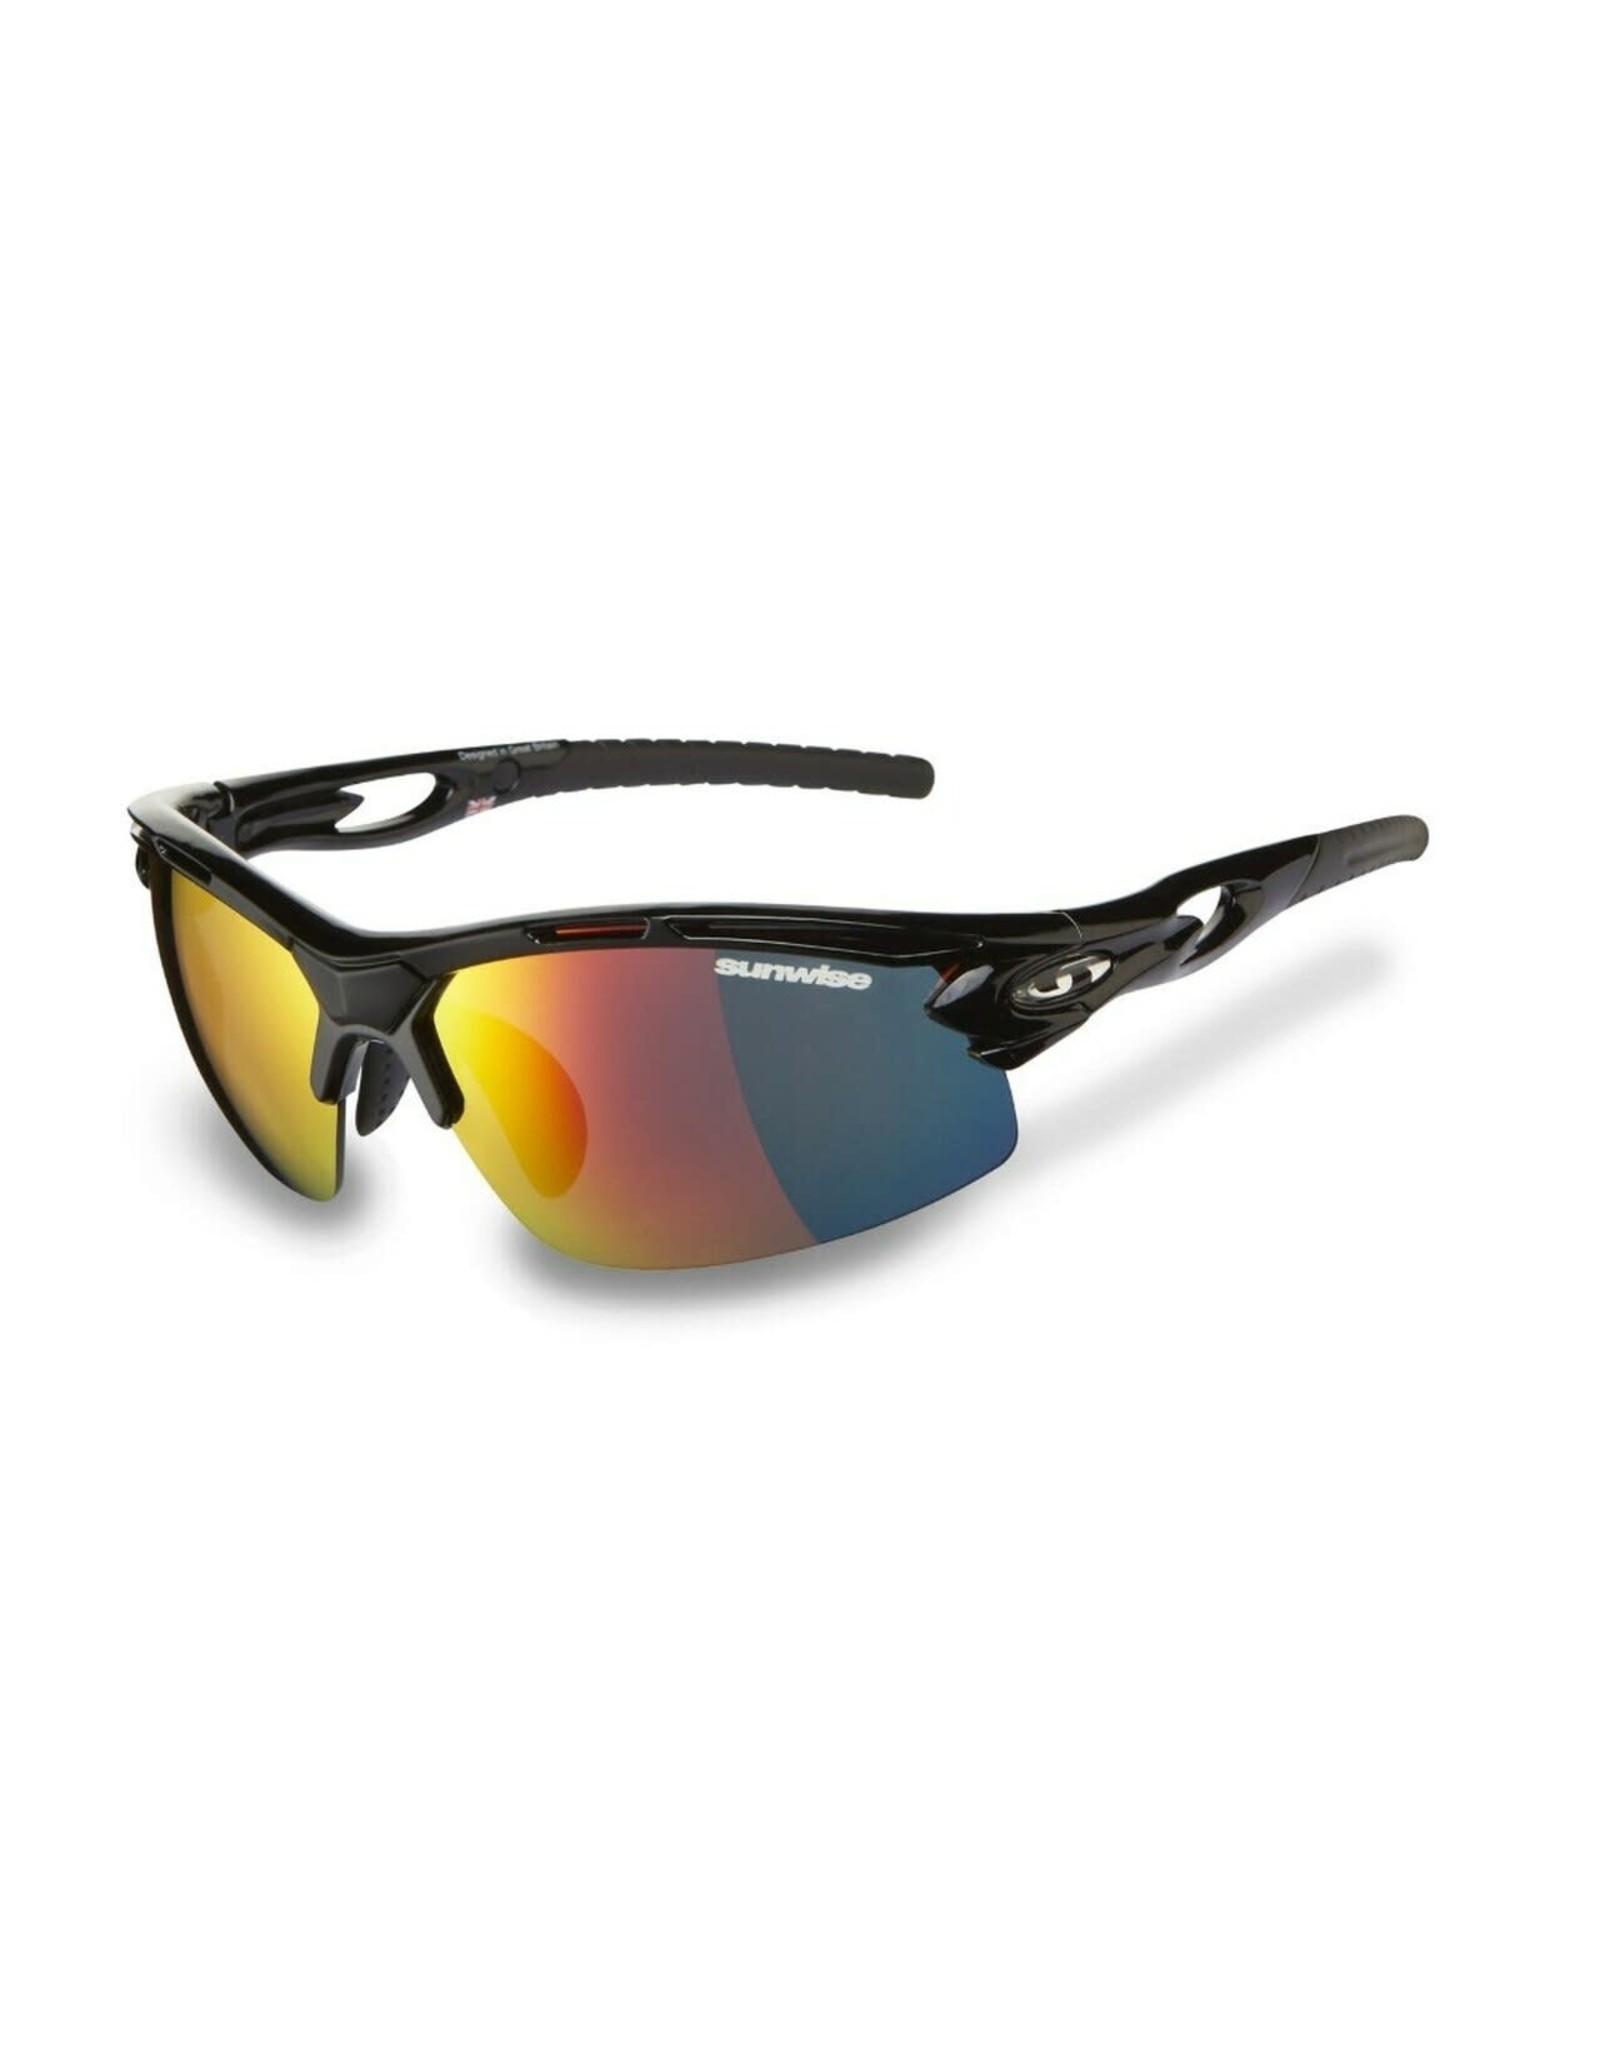 Sunwise Vertex Cycling Sunglasses w/interchangeable lenses BLACK